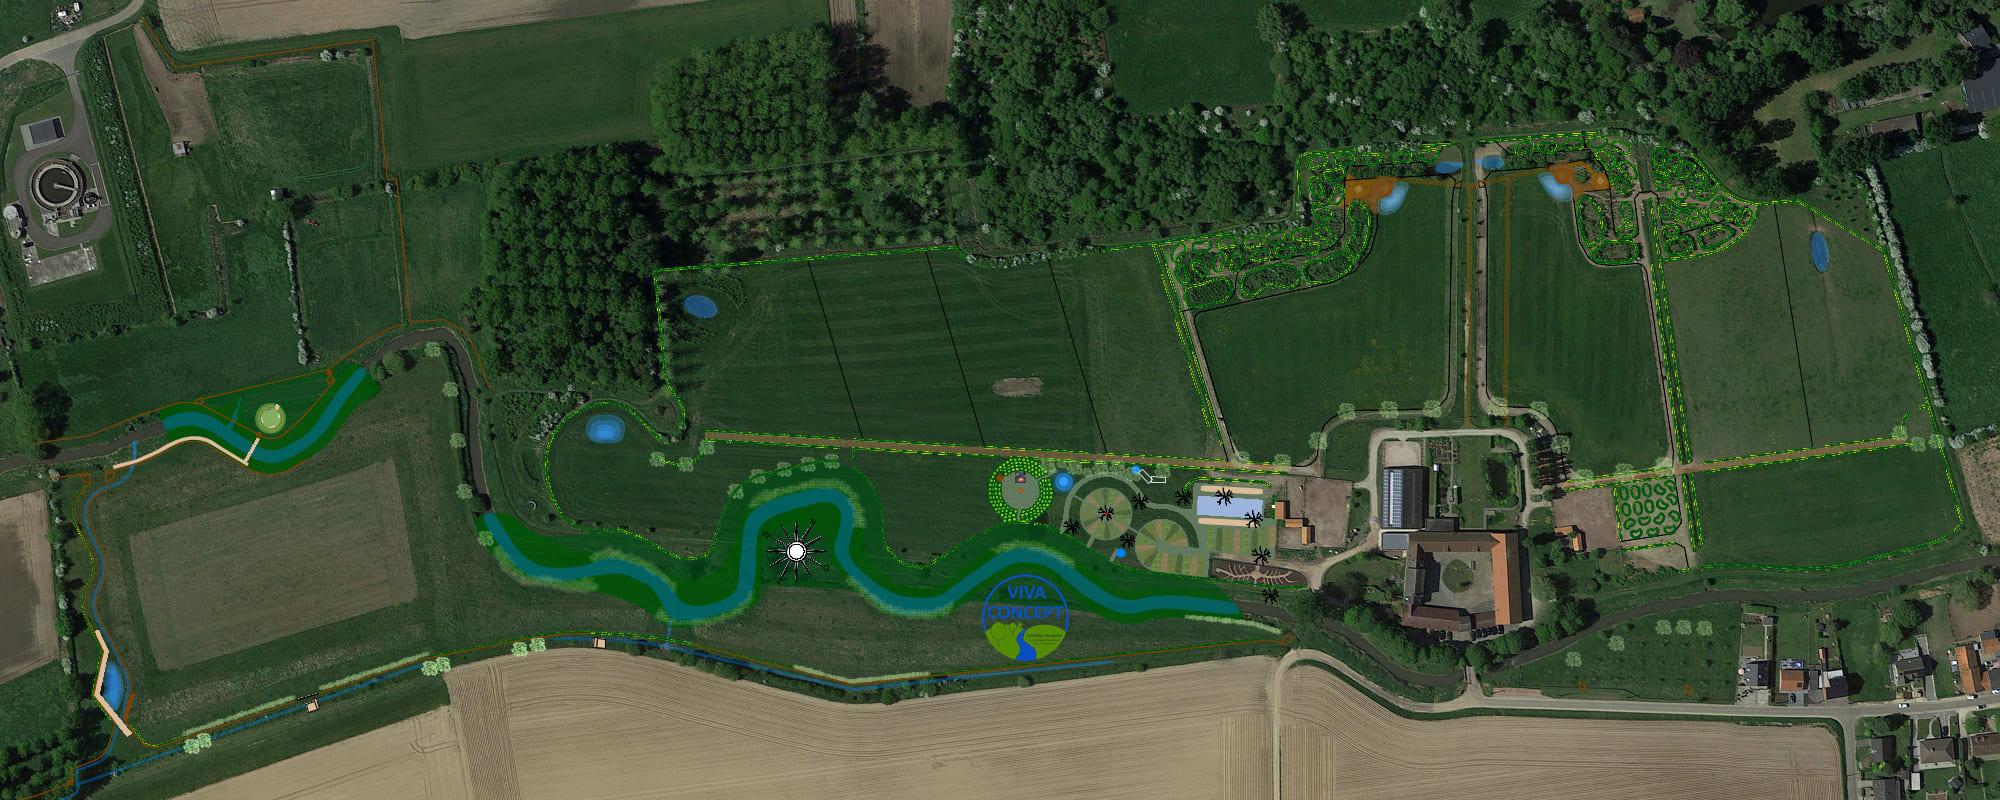 Kasteelhoeve Wange aanleg rivier project nieuws natuur